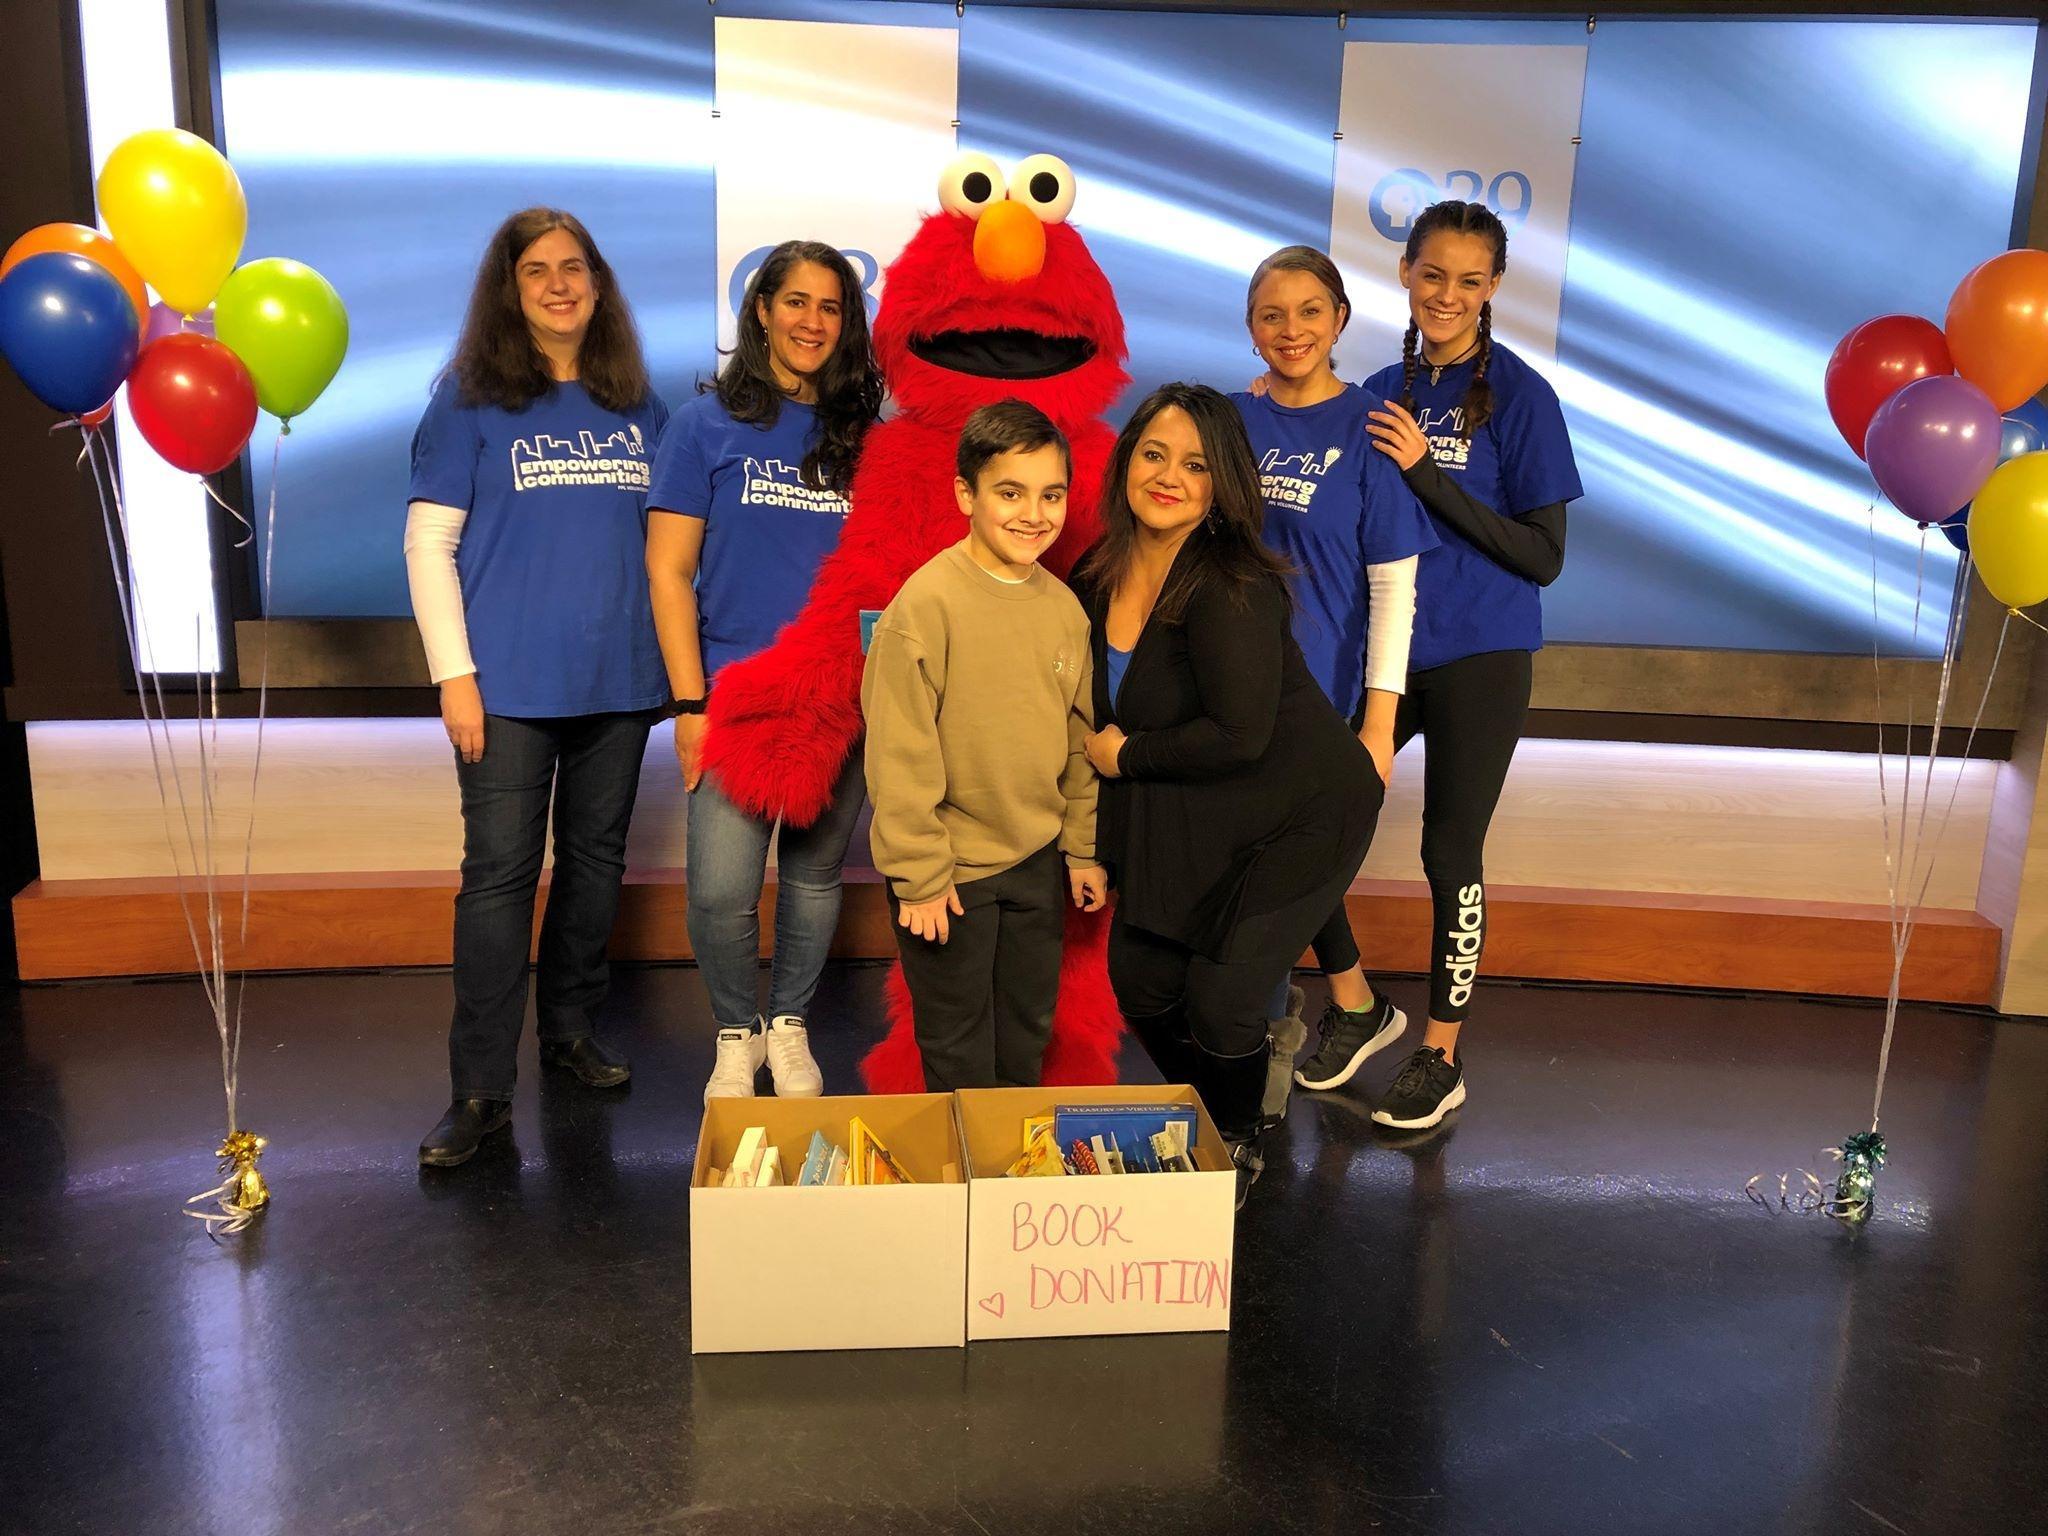 PPL corporate volunteers at Elmo's Birthday